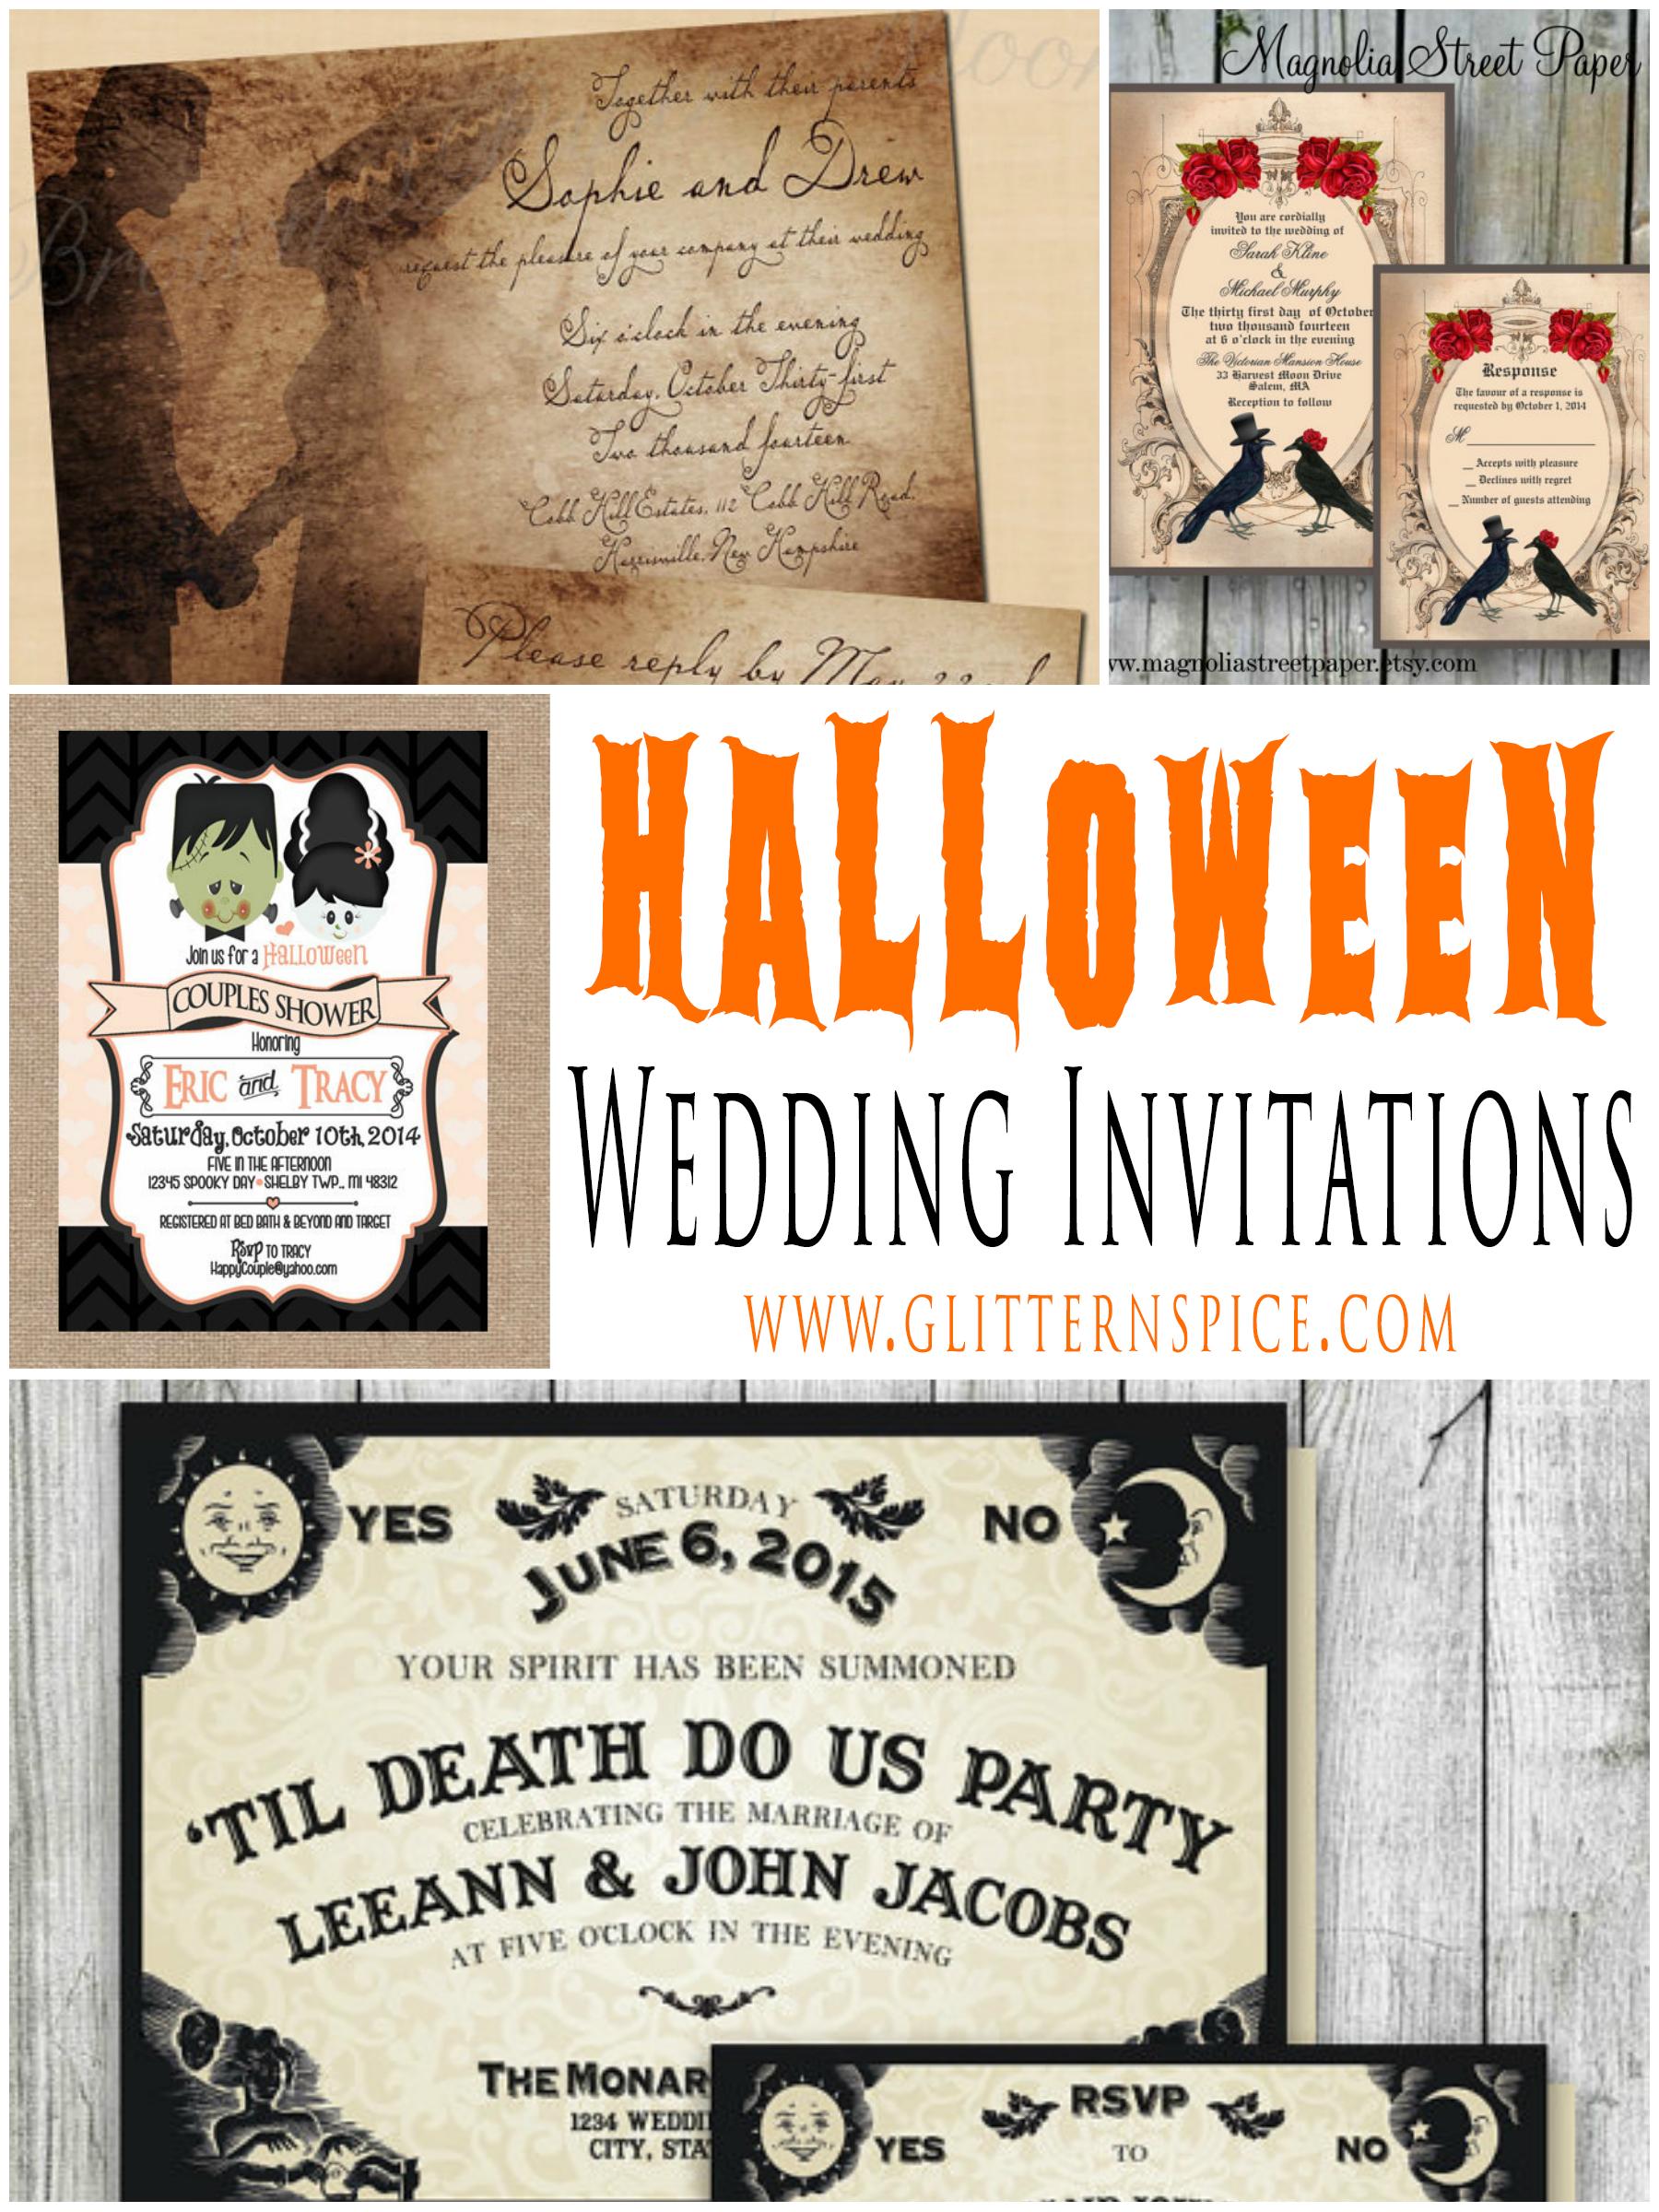 Spooktacular Halloween Wedding Invitations • Glitter 'n Spice - Free Printable Halloween Wedding Invitations